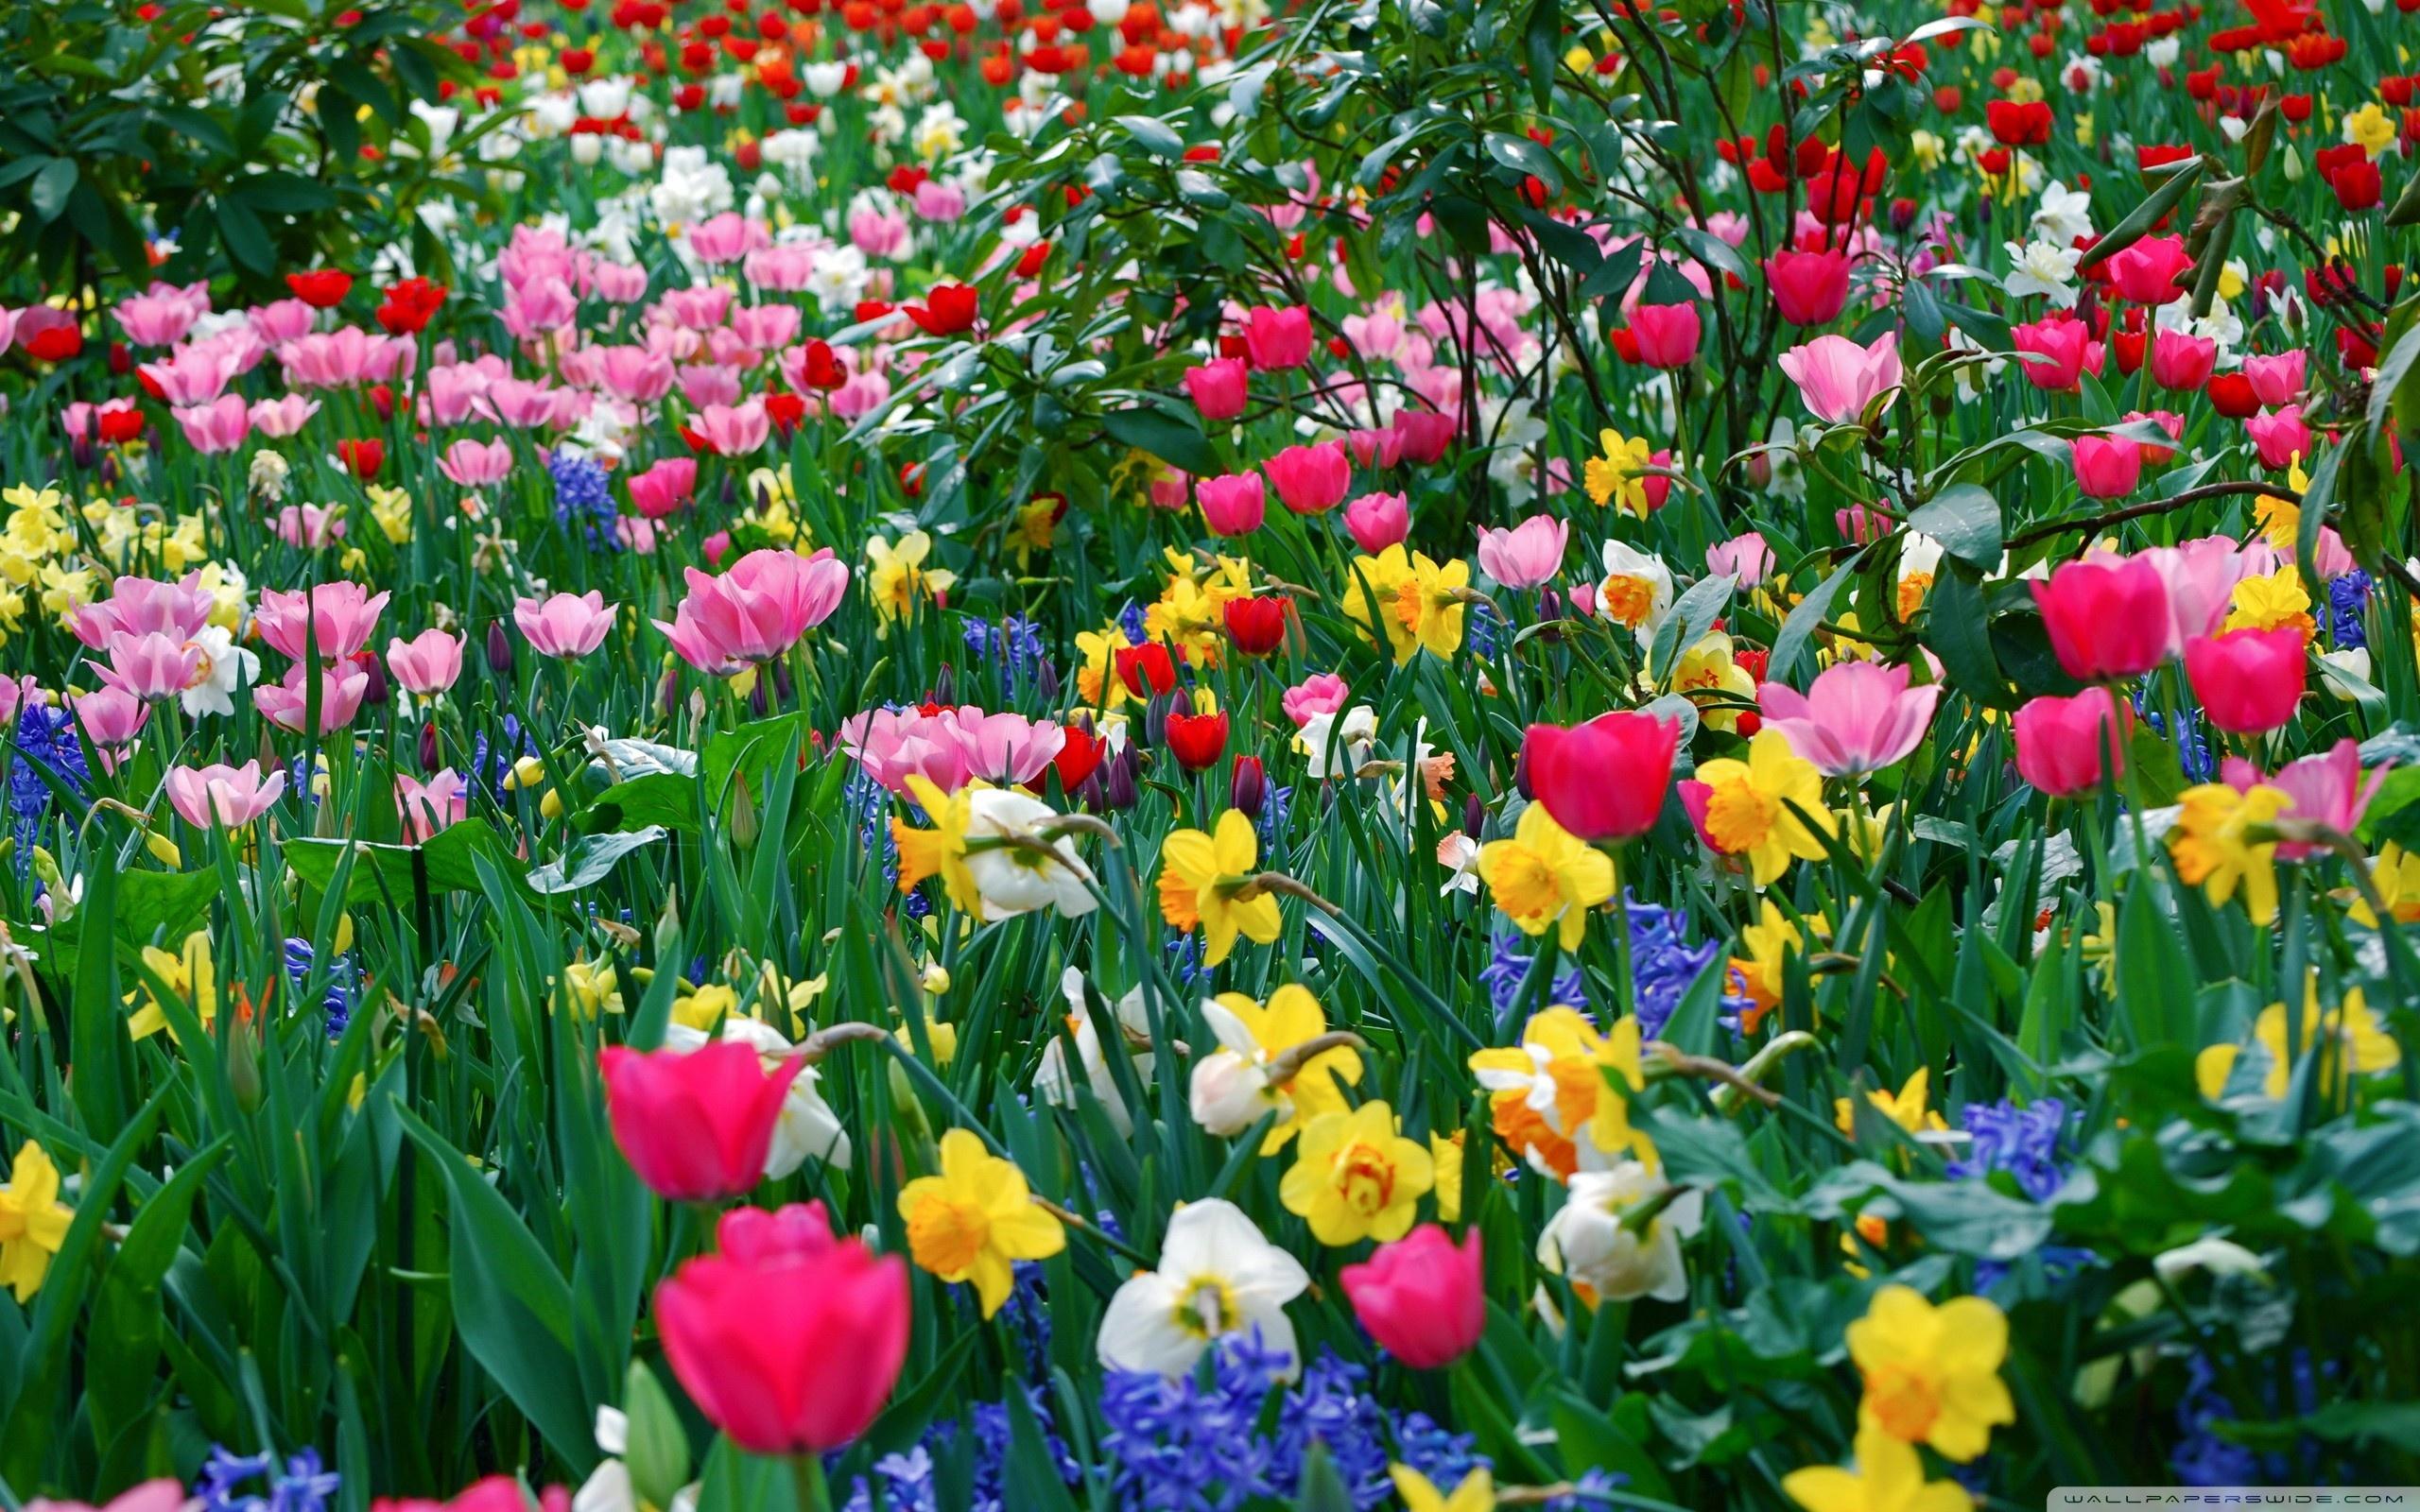 Spring Flowers wallpaper.